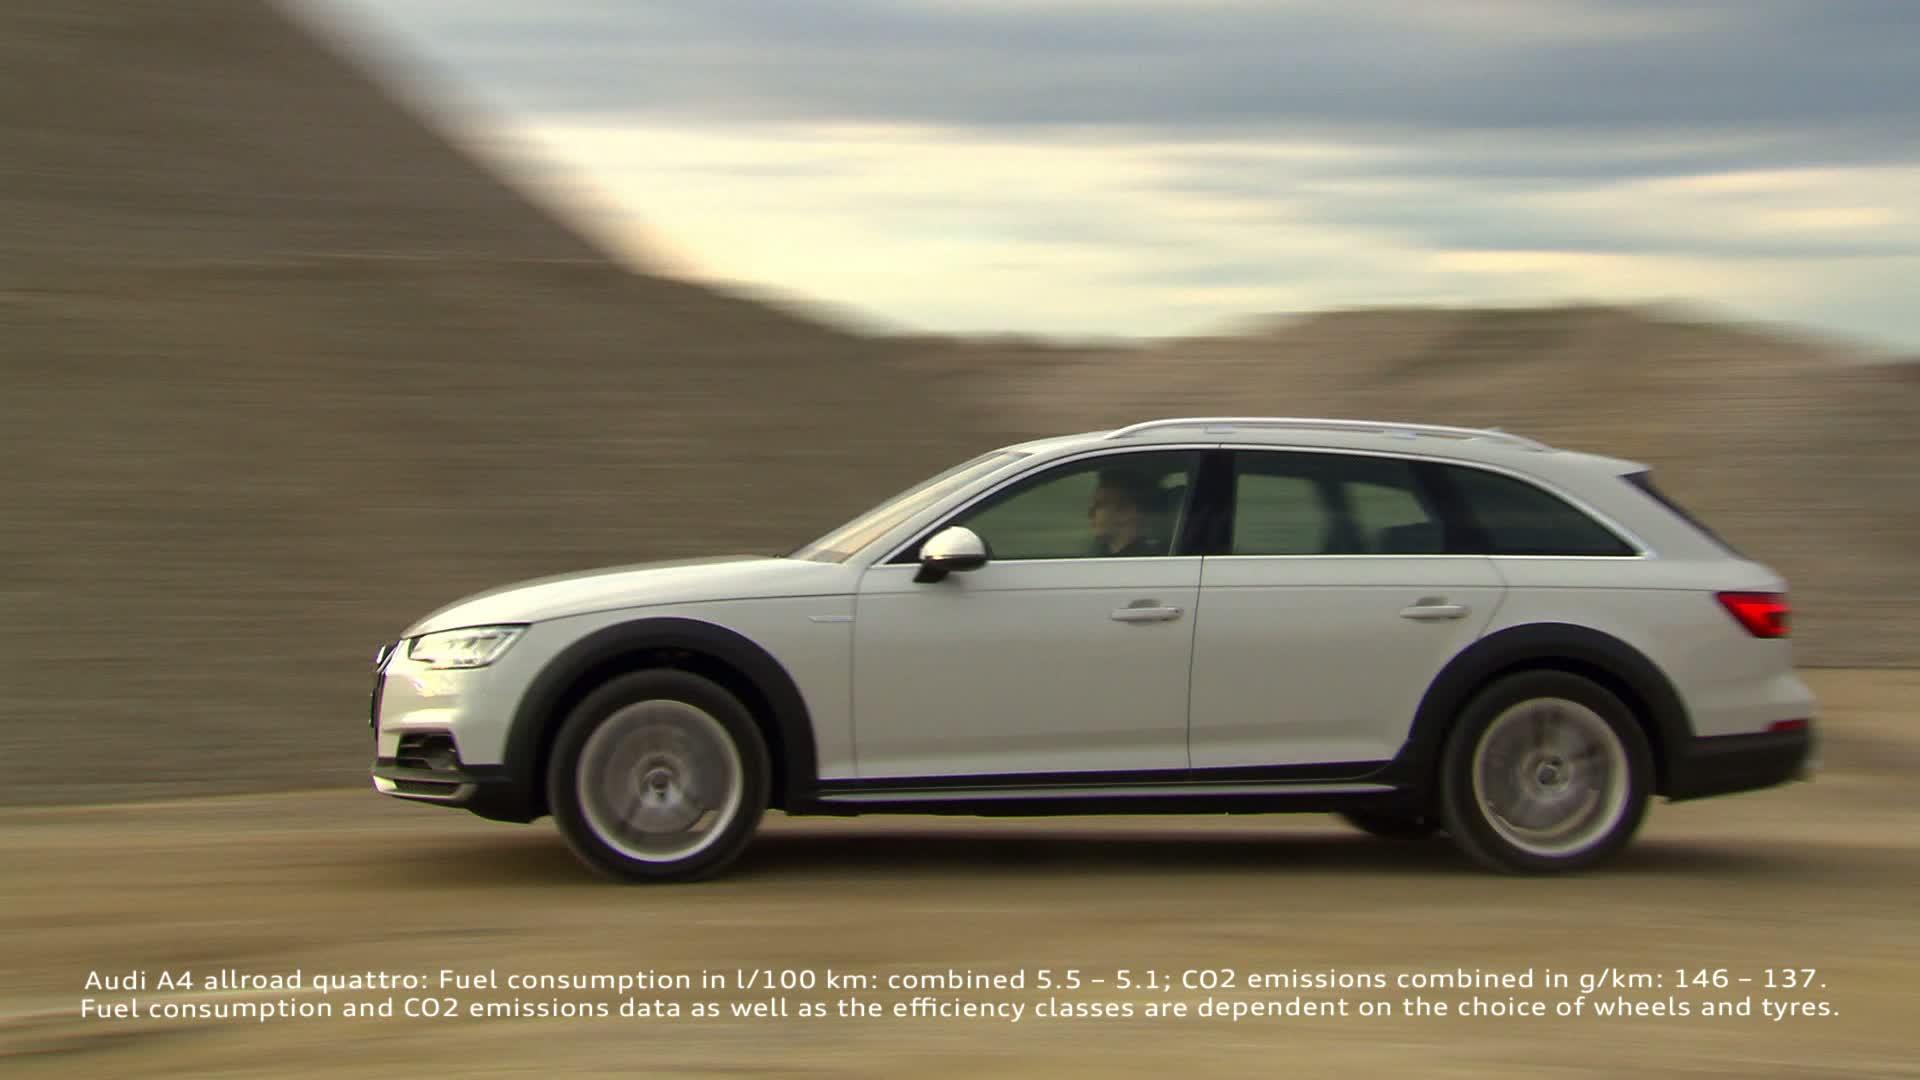 medium resolution of the new audi a4 allroad quattro all round car with off road capabilities video audi mediatv